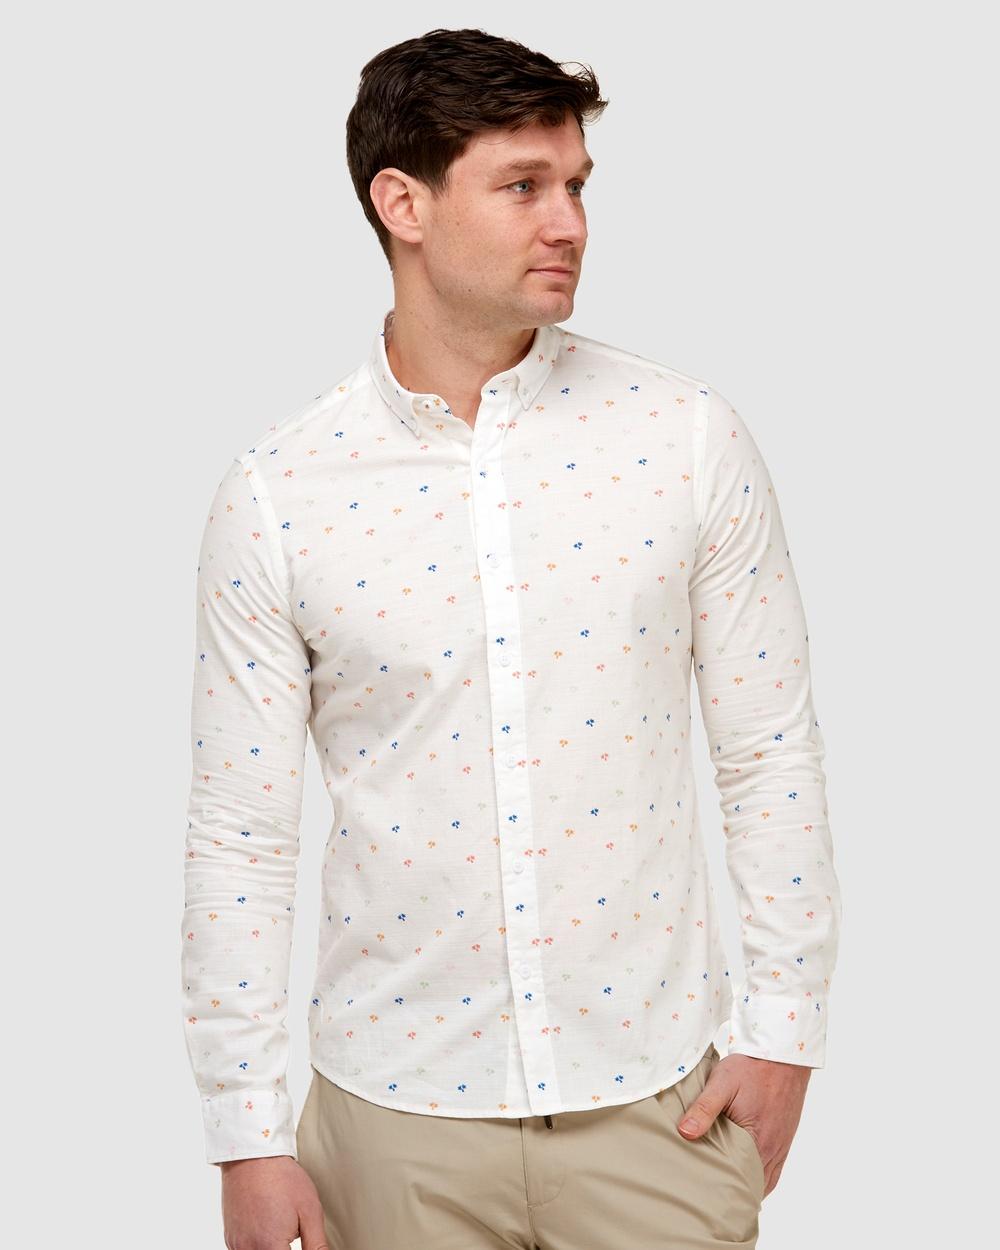 Brooksfield Palm Print Casual Shirt shirts WHITE